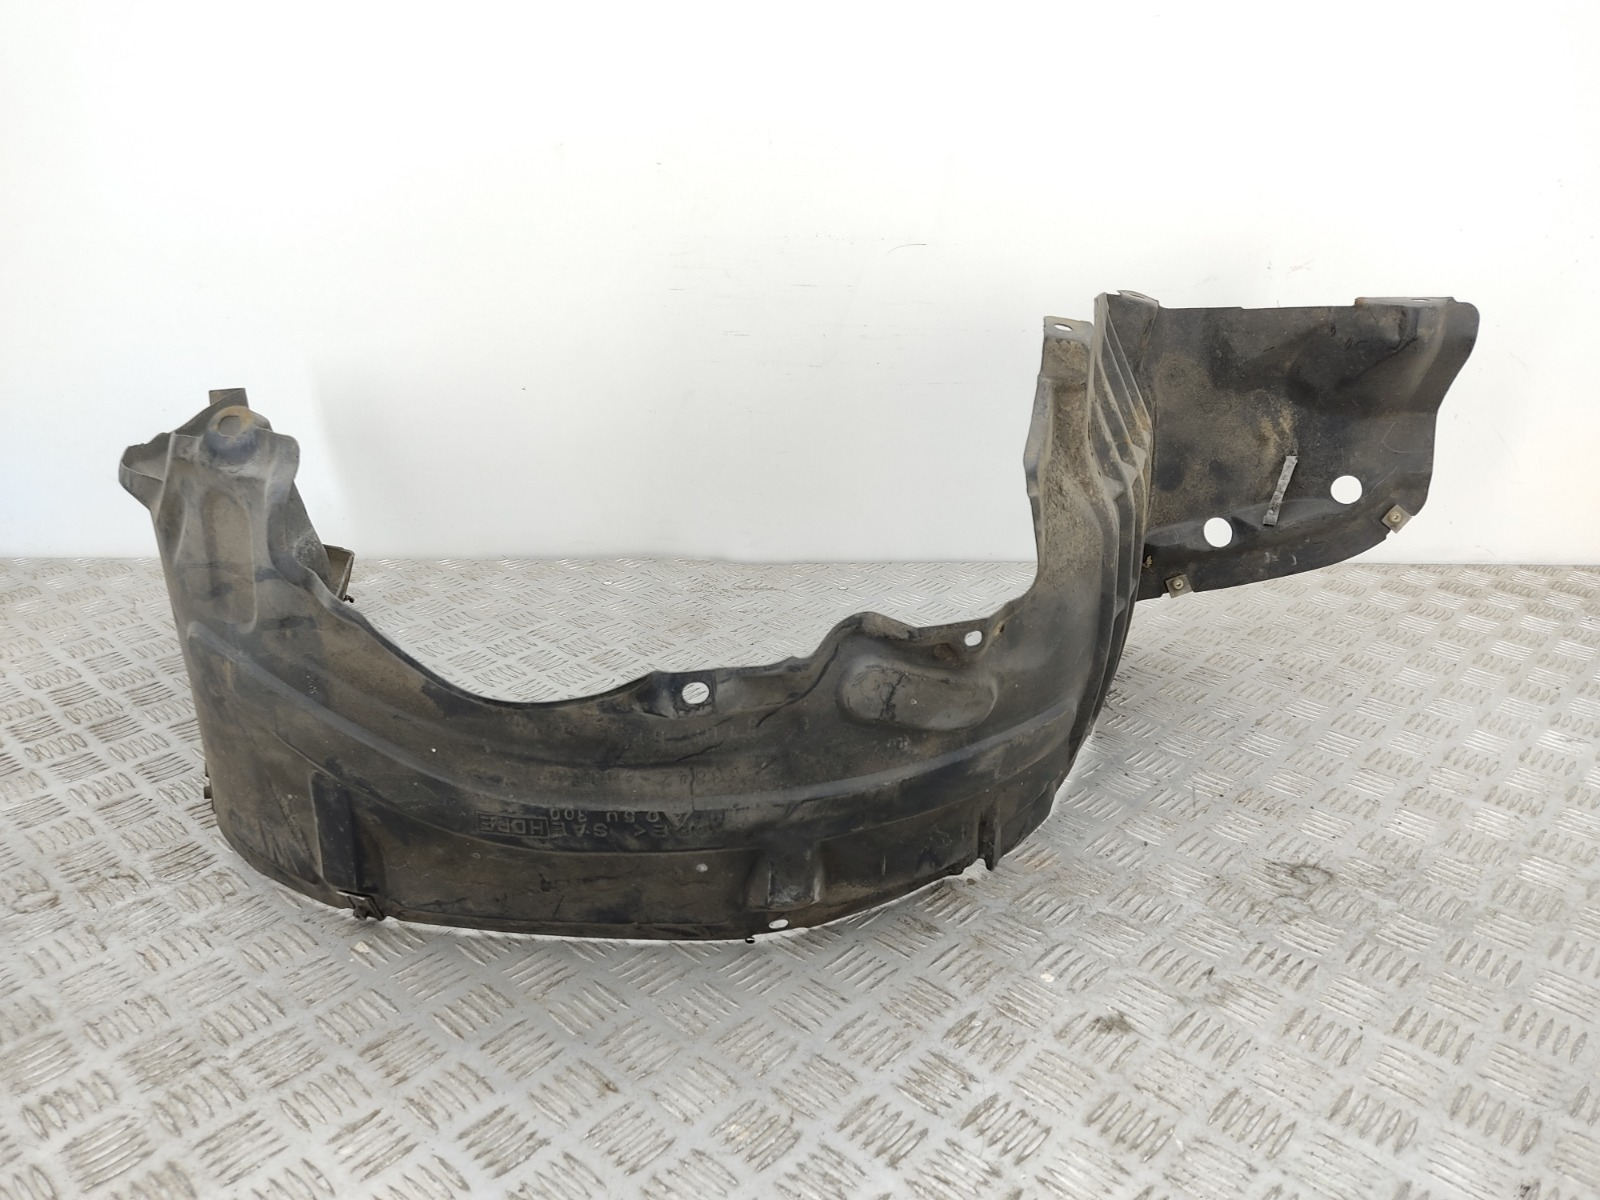 Защита арок передняя правая (подкрылок) Nissan Almera Tino 2.0 I 2002 (б/у)